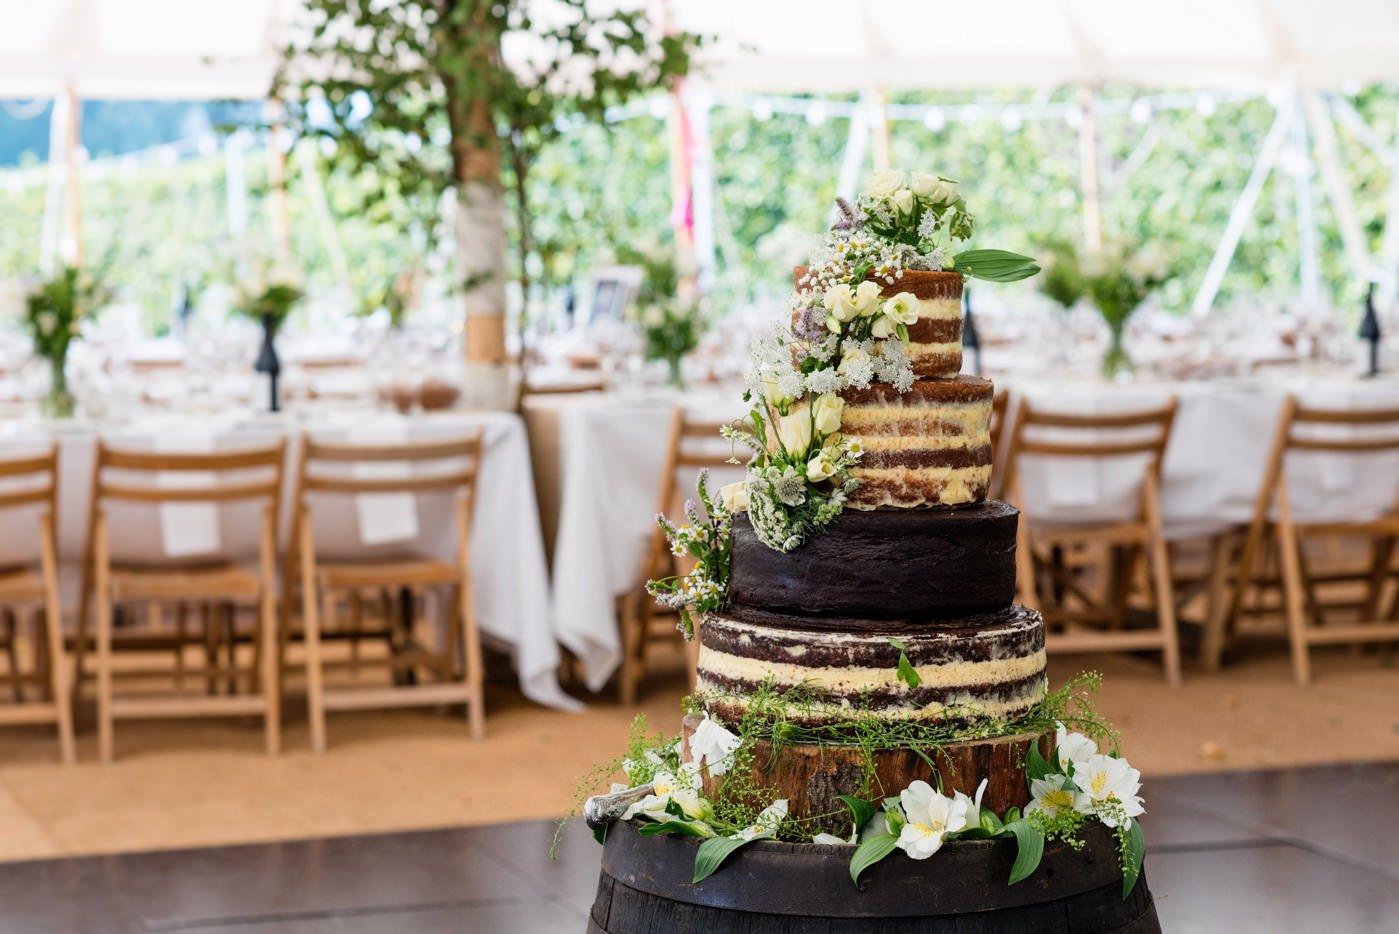 bignor-park-wedding-photography-robyn-and-tom-66